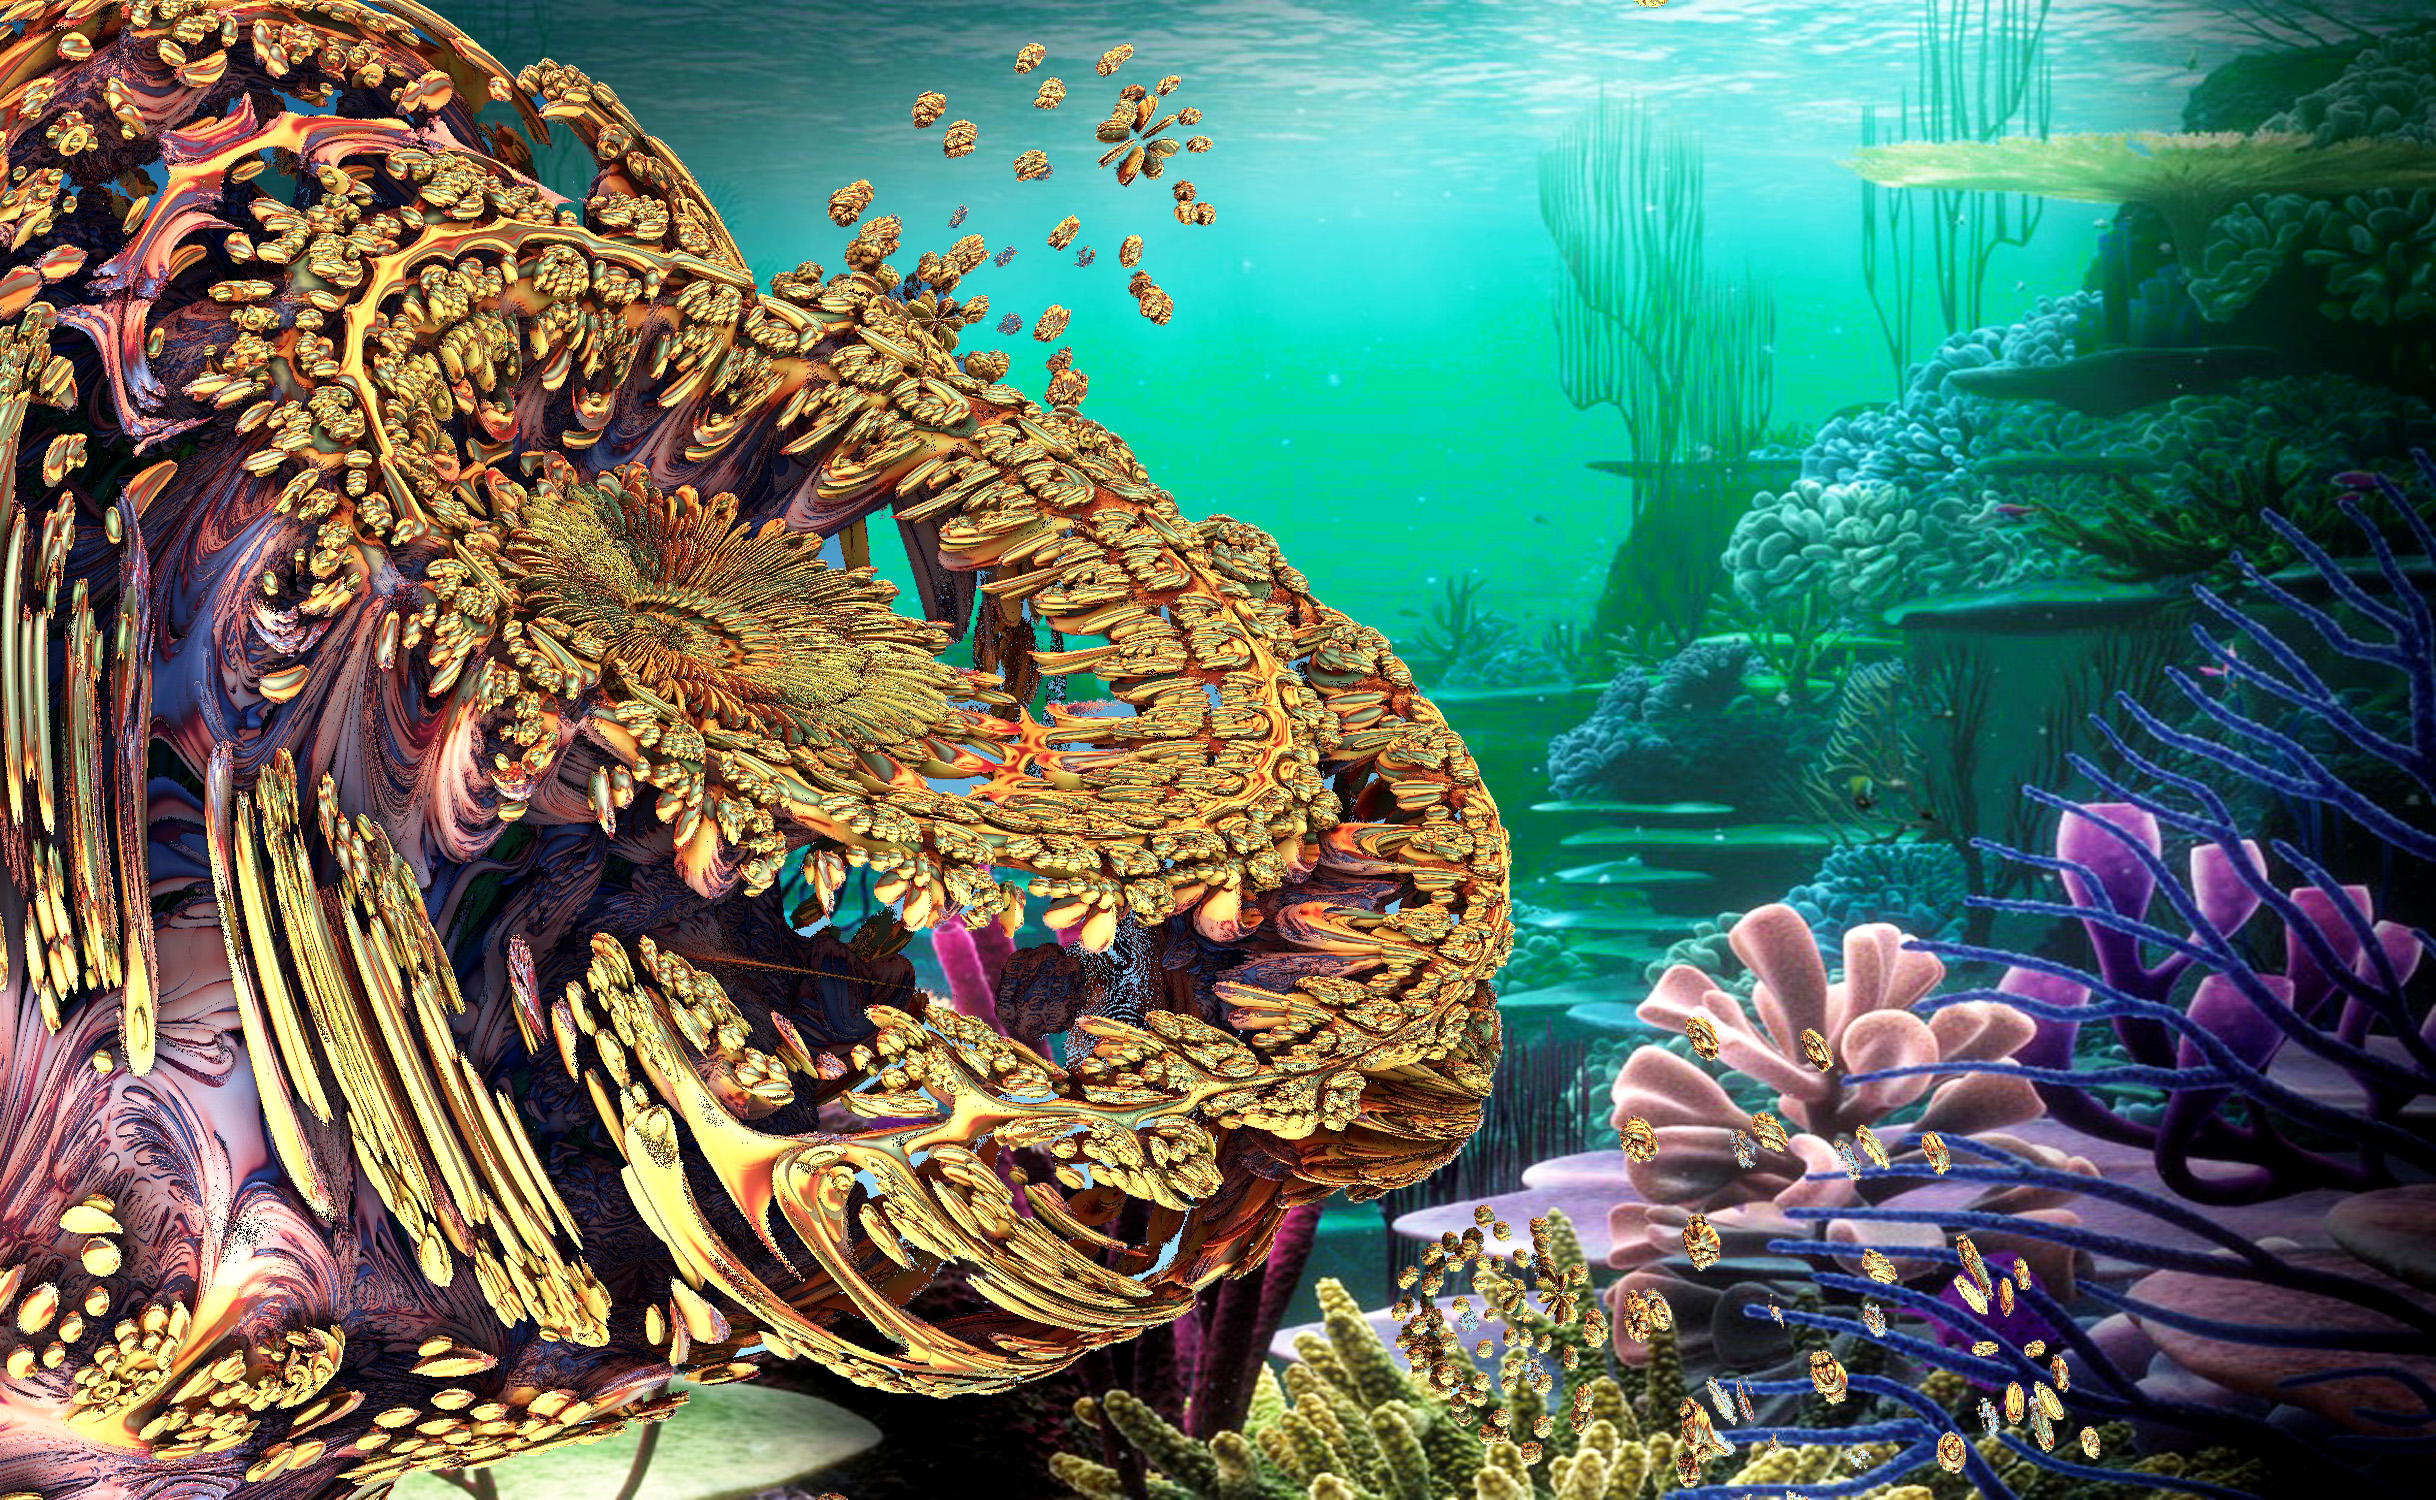 OCEAN LIFE by DorianoArt